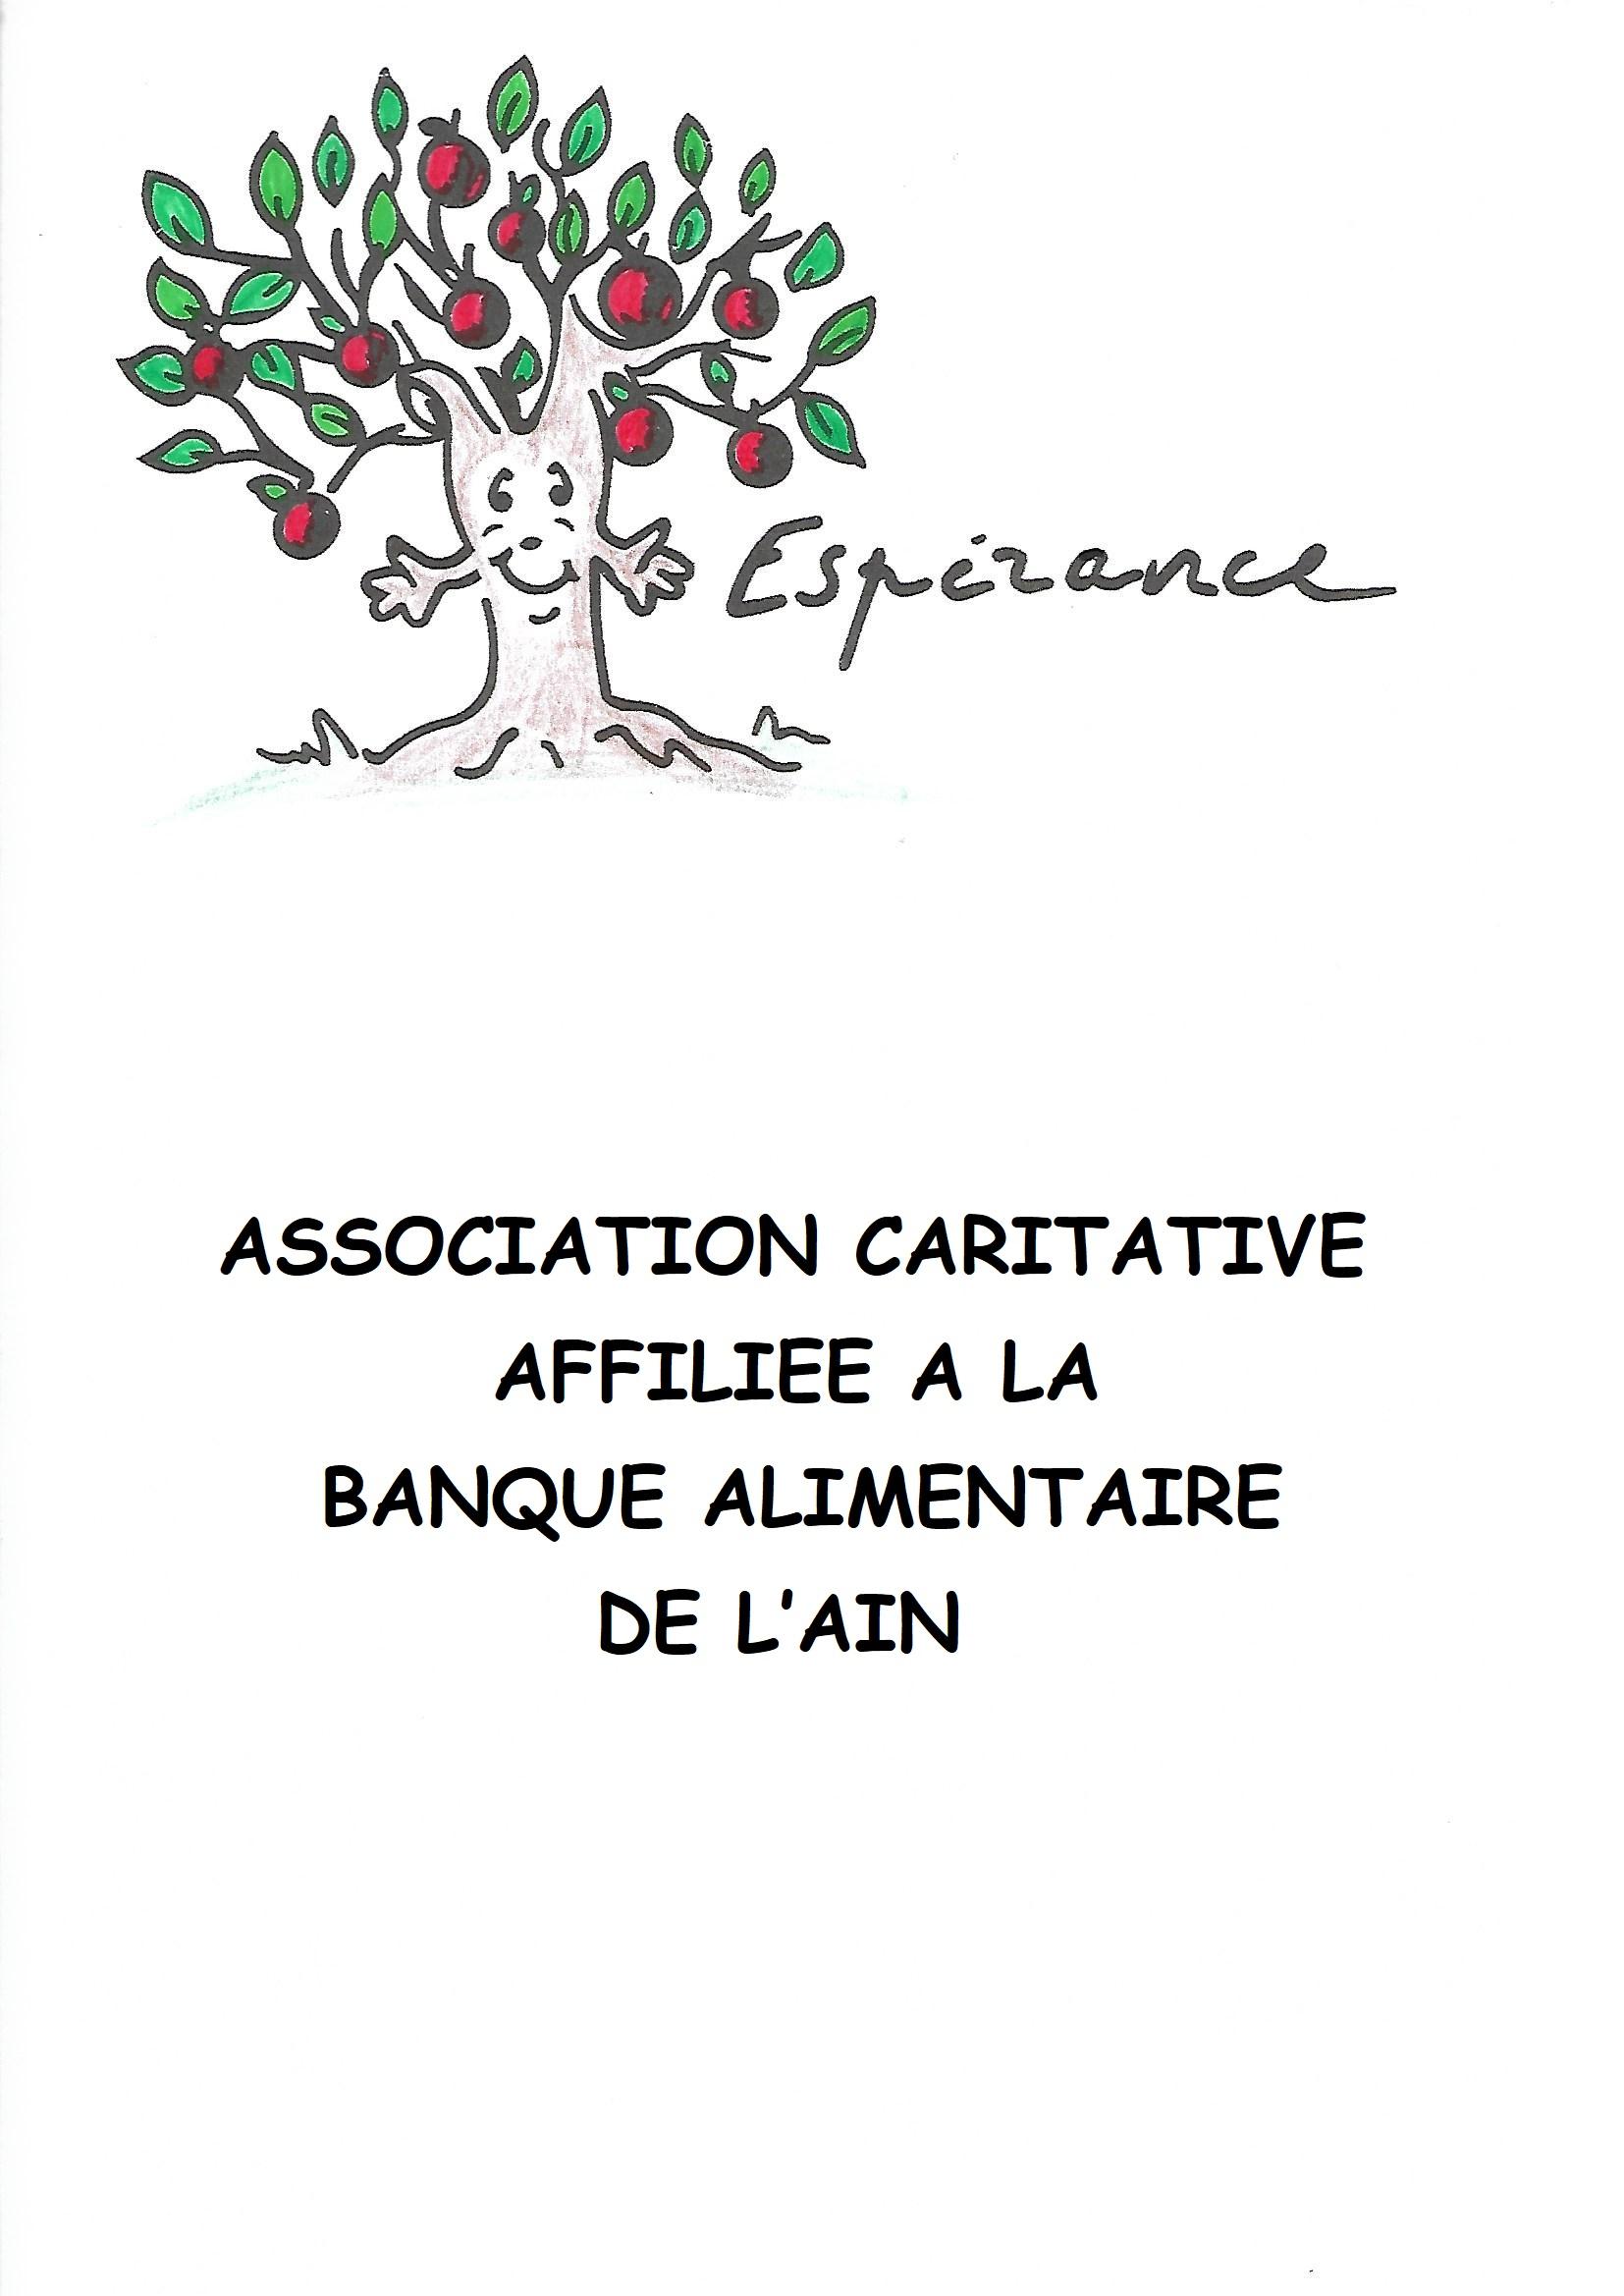 Logo espérance couleur ok FINAL grande affiche